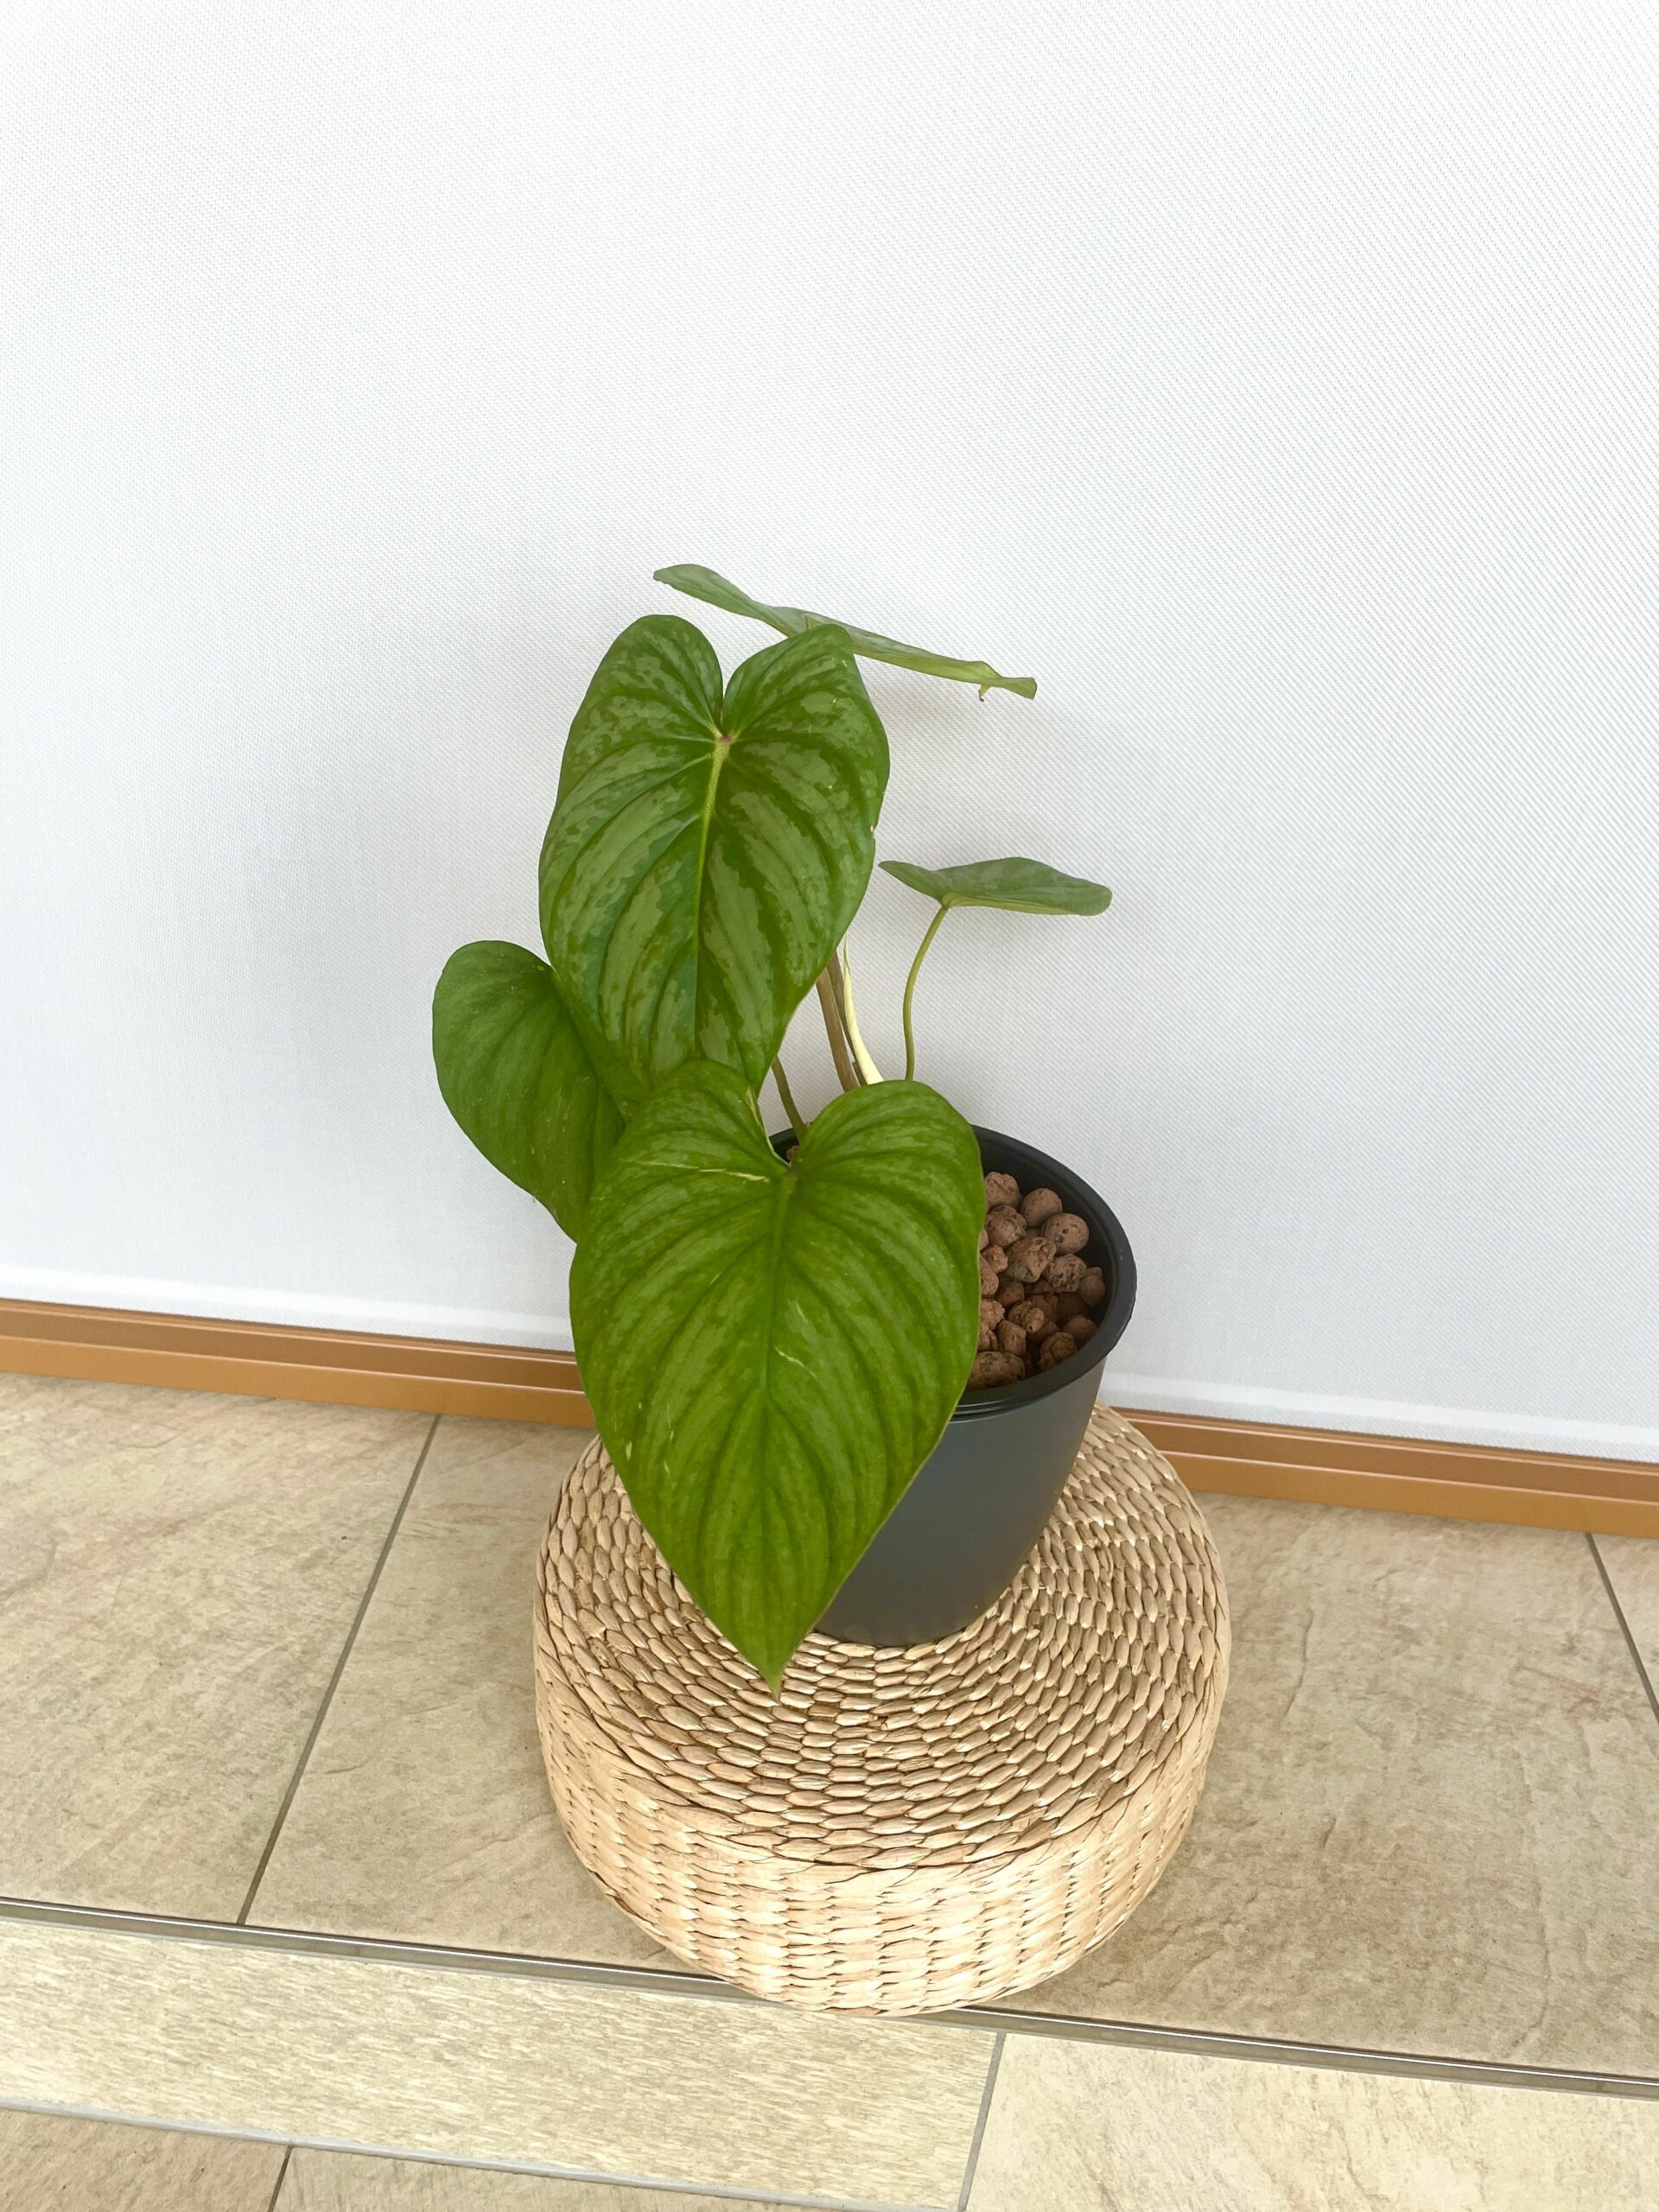 Philodendron Sodiroi Aff 2